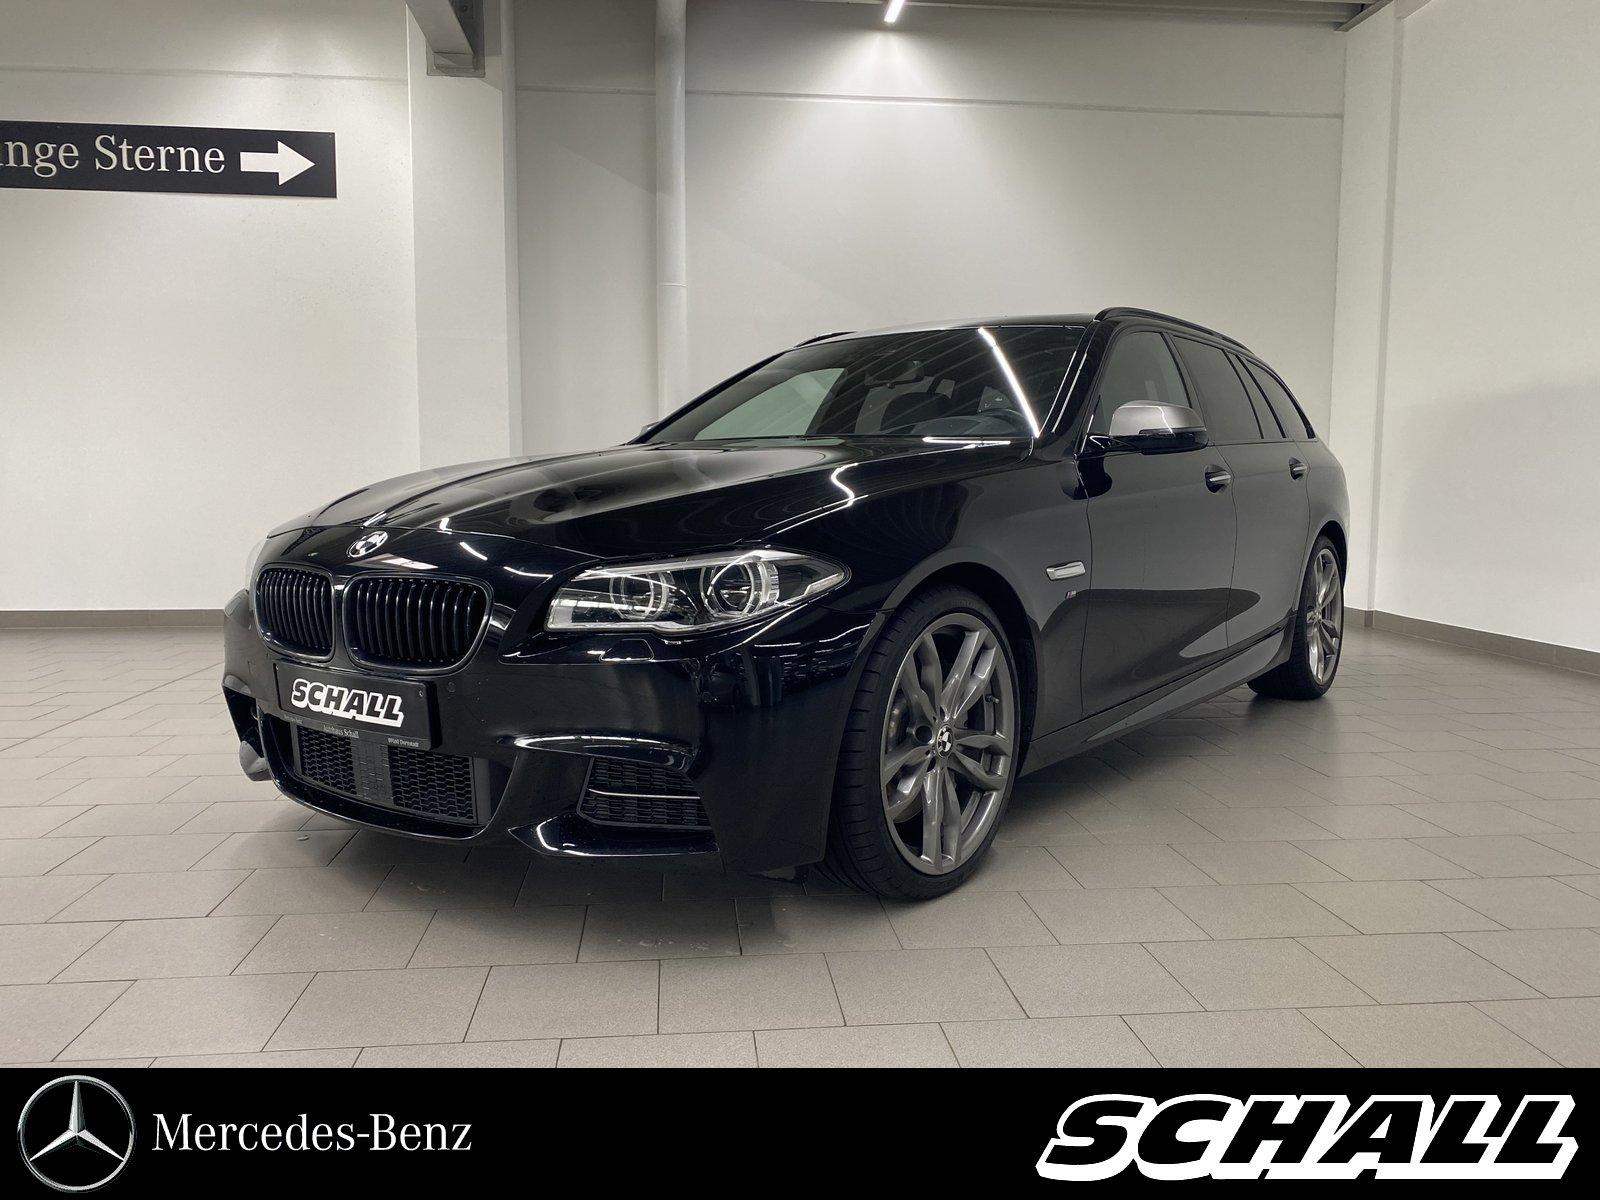 BMW M550 d TxDrive STANDHZG/PANORAMA/AHK/20-ZOLL, Jahr 2016, Diesel